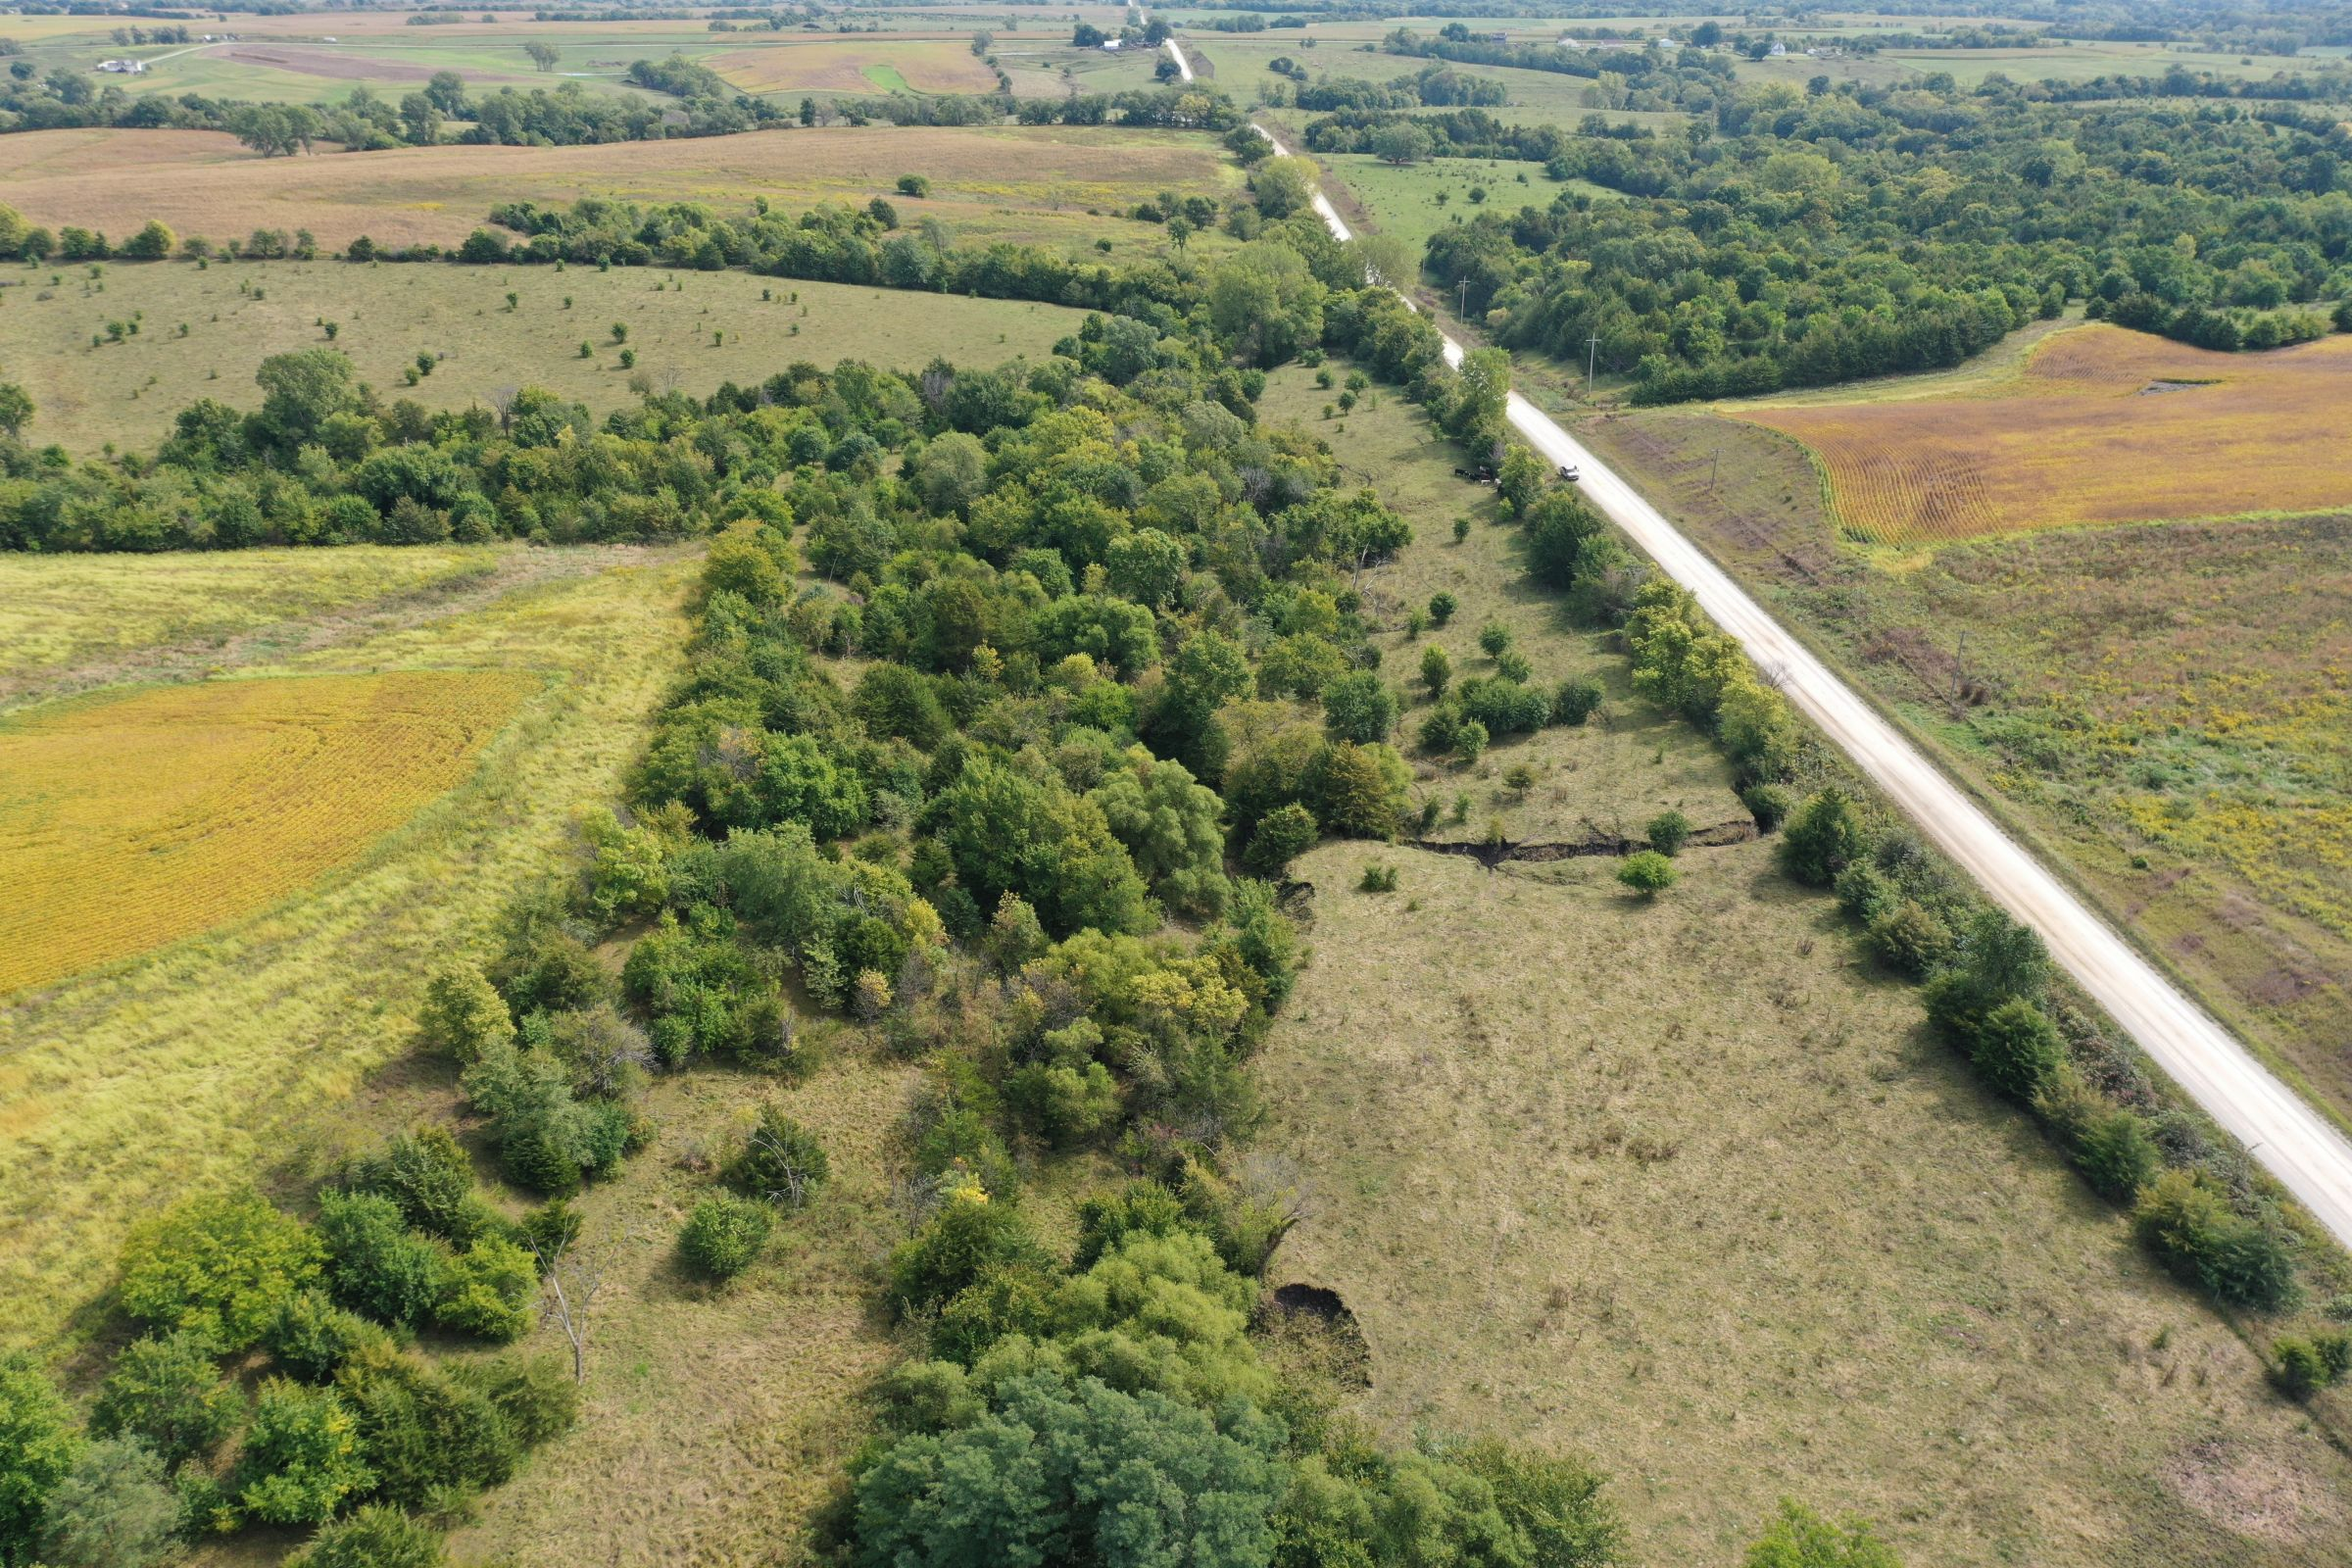 clarke-county-iowa-37-acres-listing-number-15398-1-2021-03-08-151151.jpg